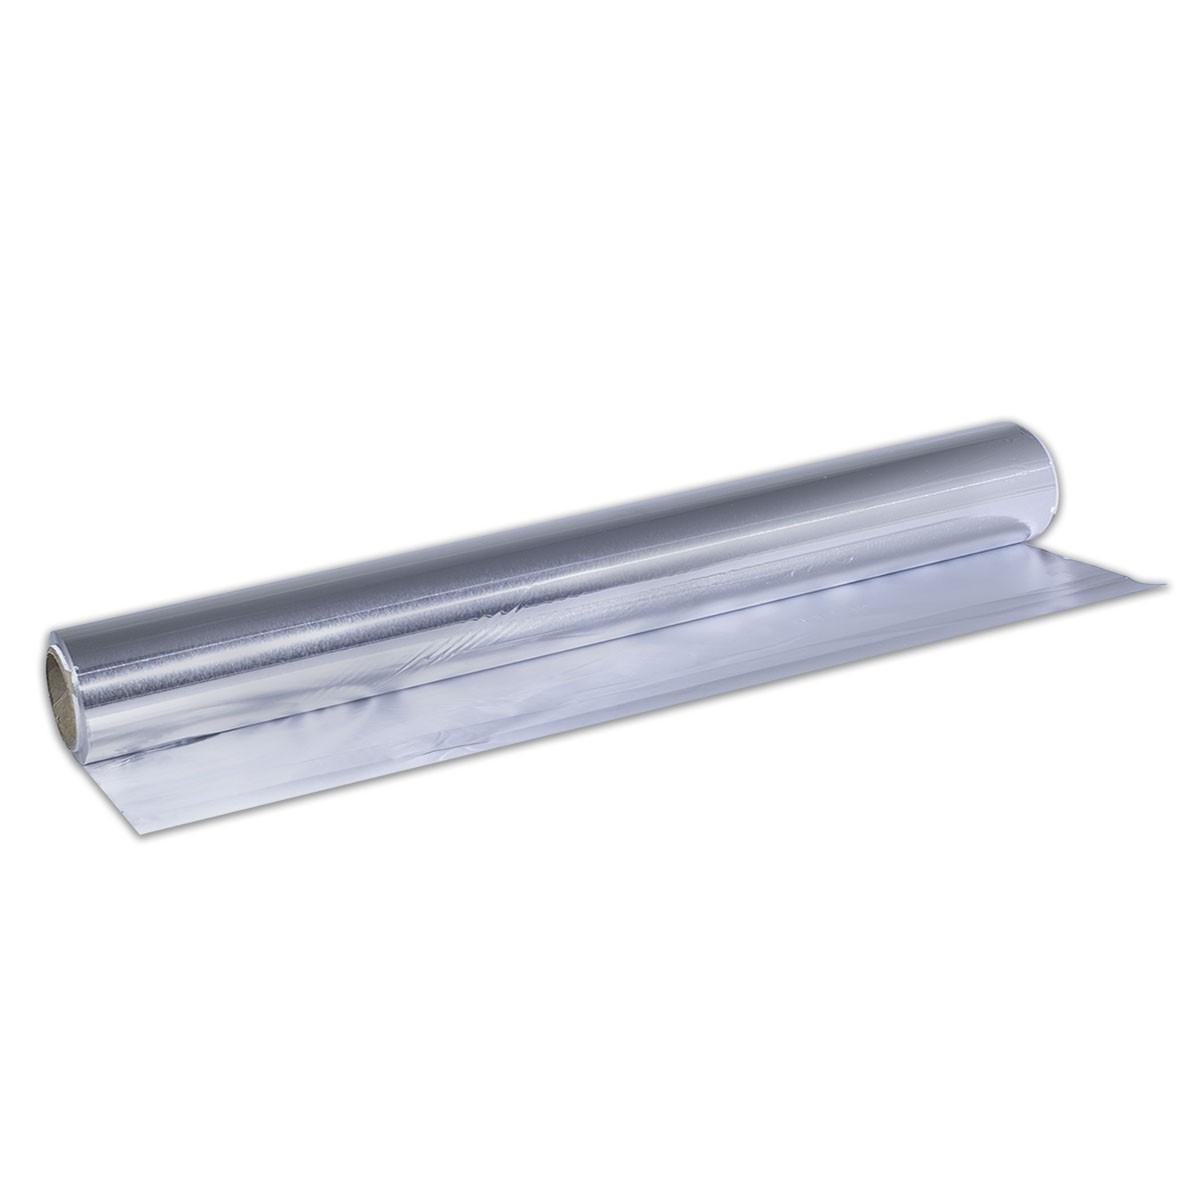 Aluminium Foil 37.5sqft - 20mic. | 24rolls